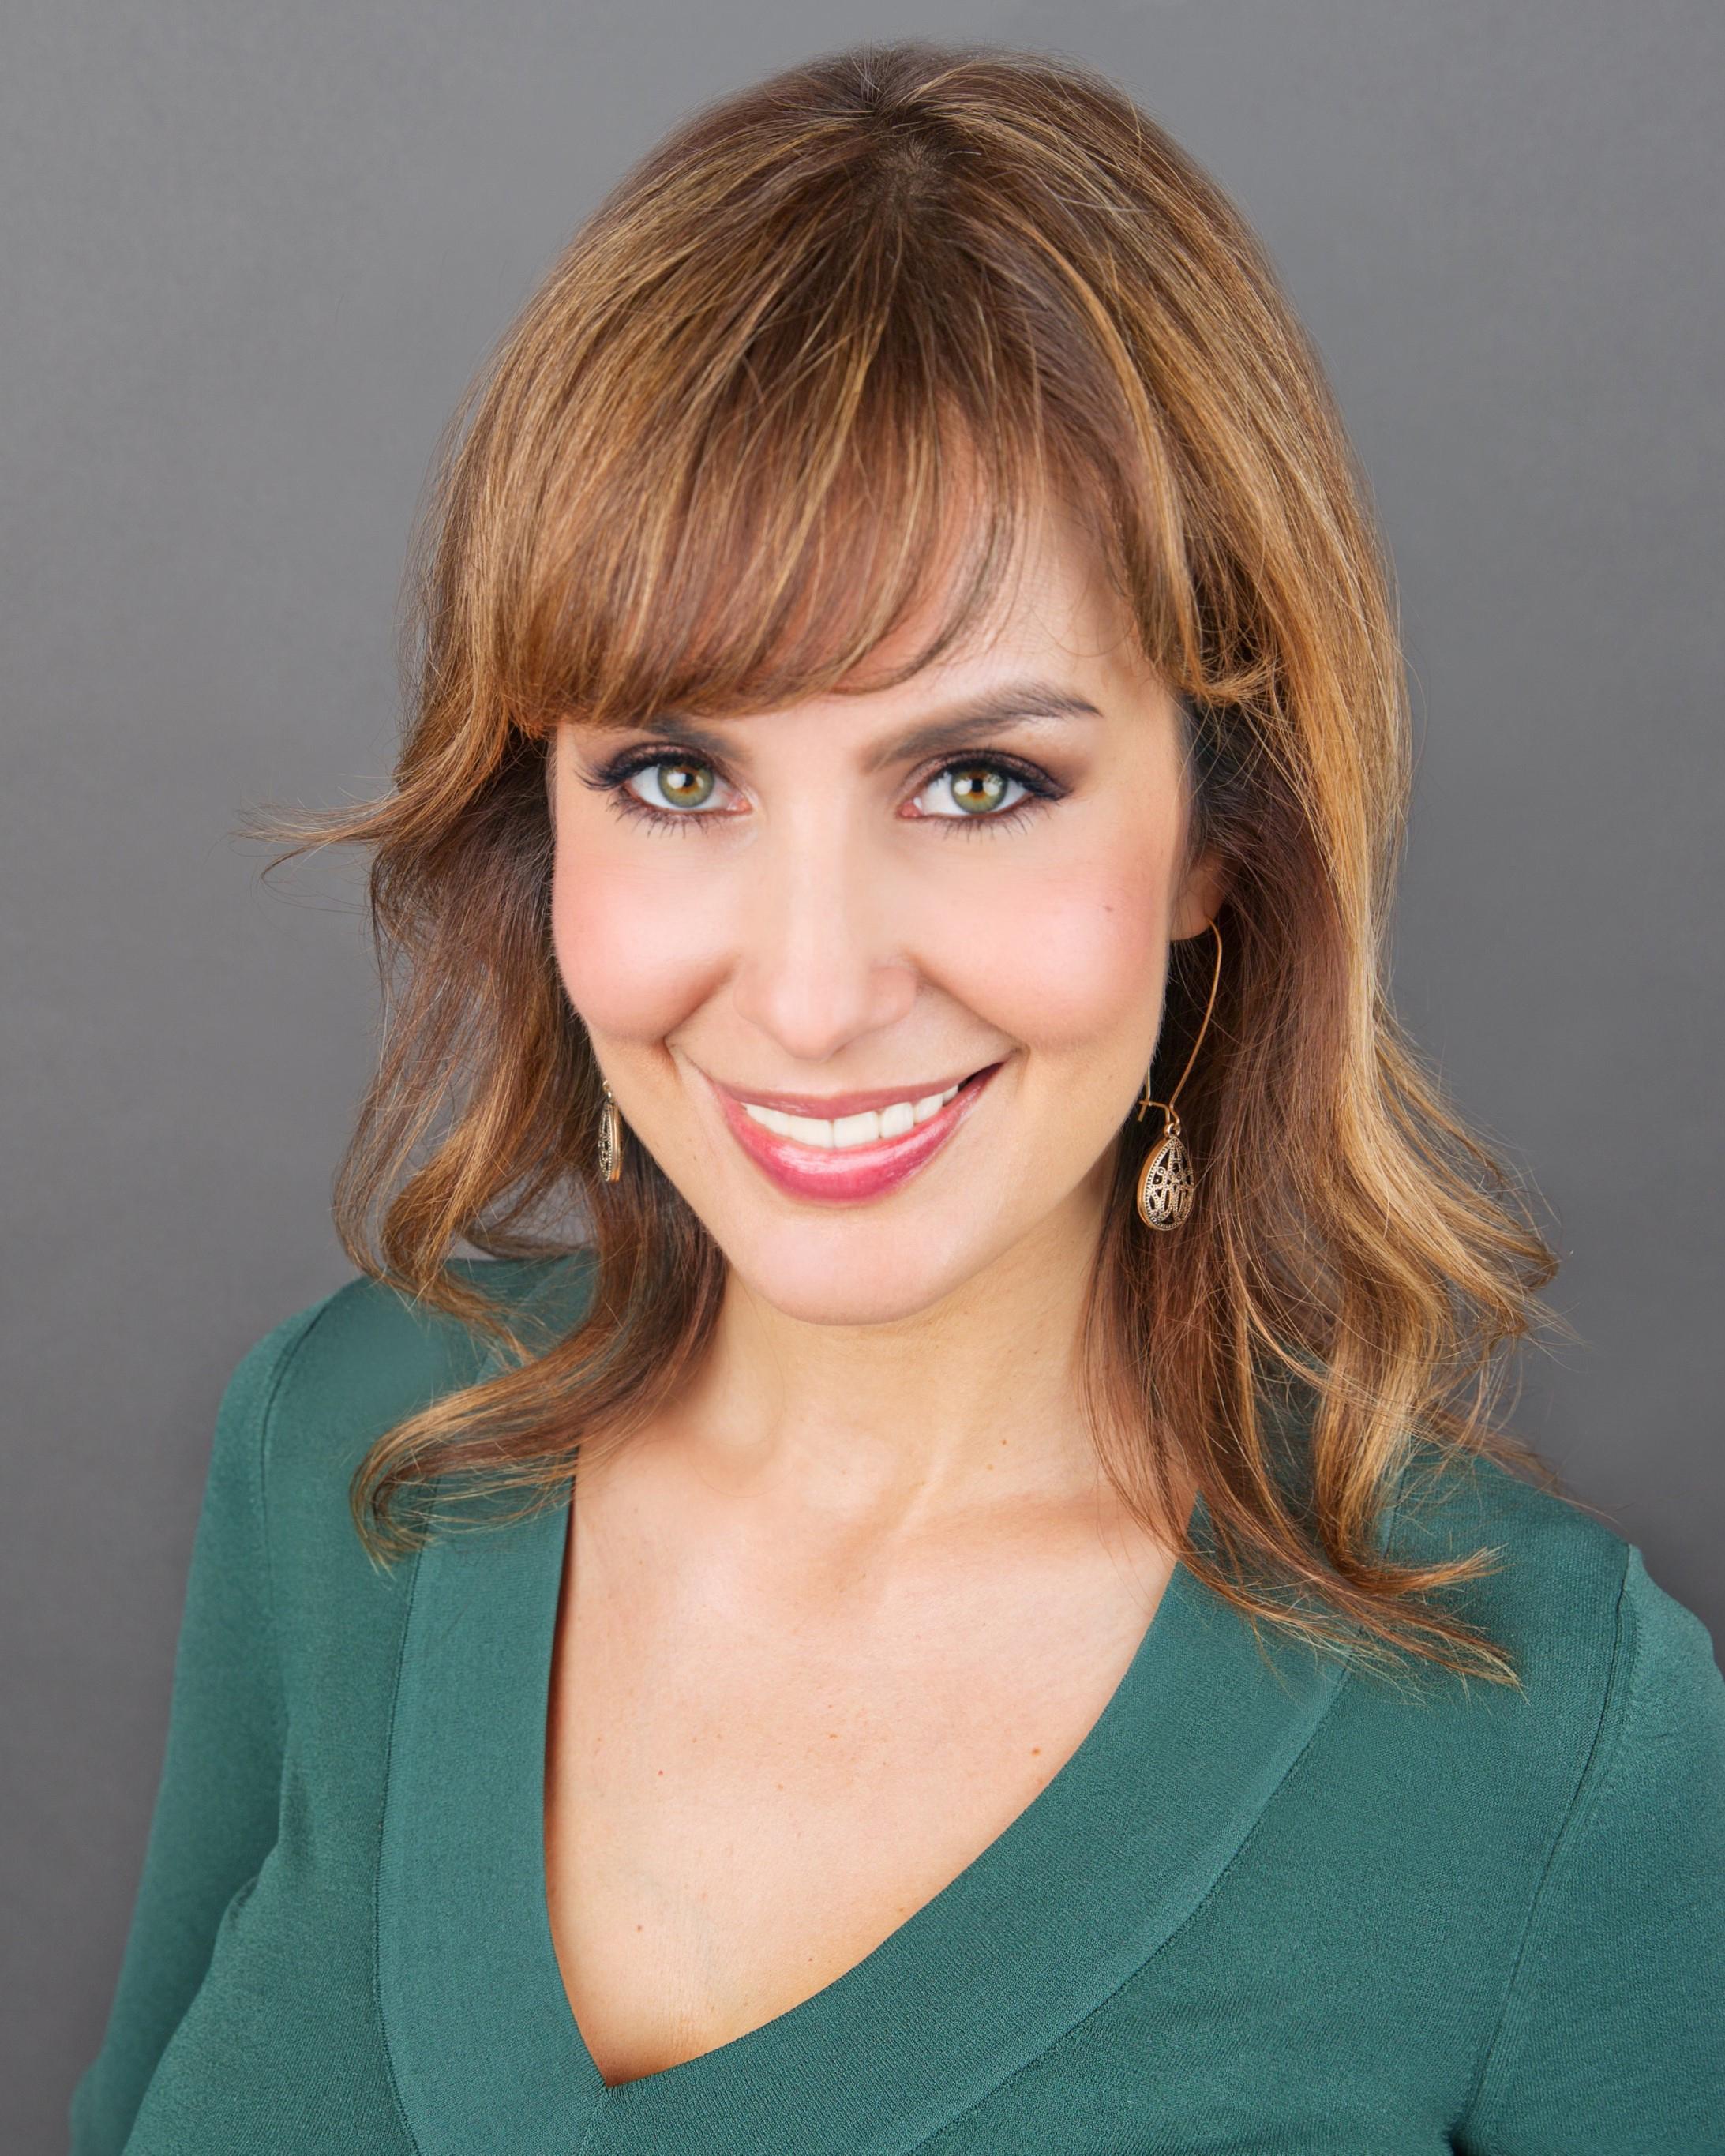 Tina Romero, Business Development, Marketing, Pure Gold Realty, Austin, Texas